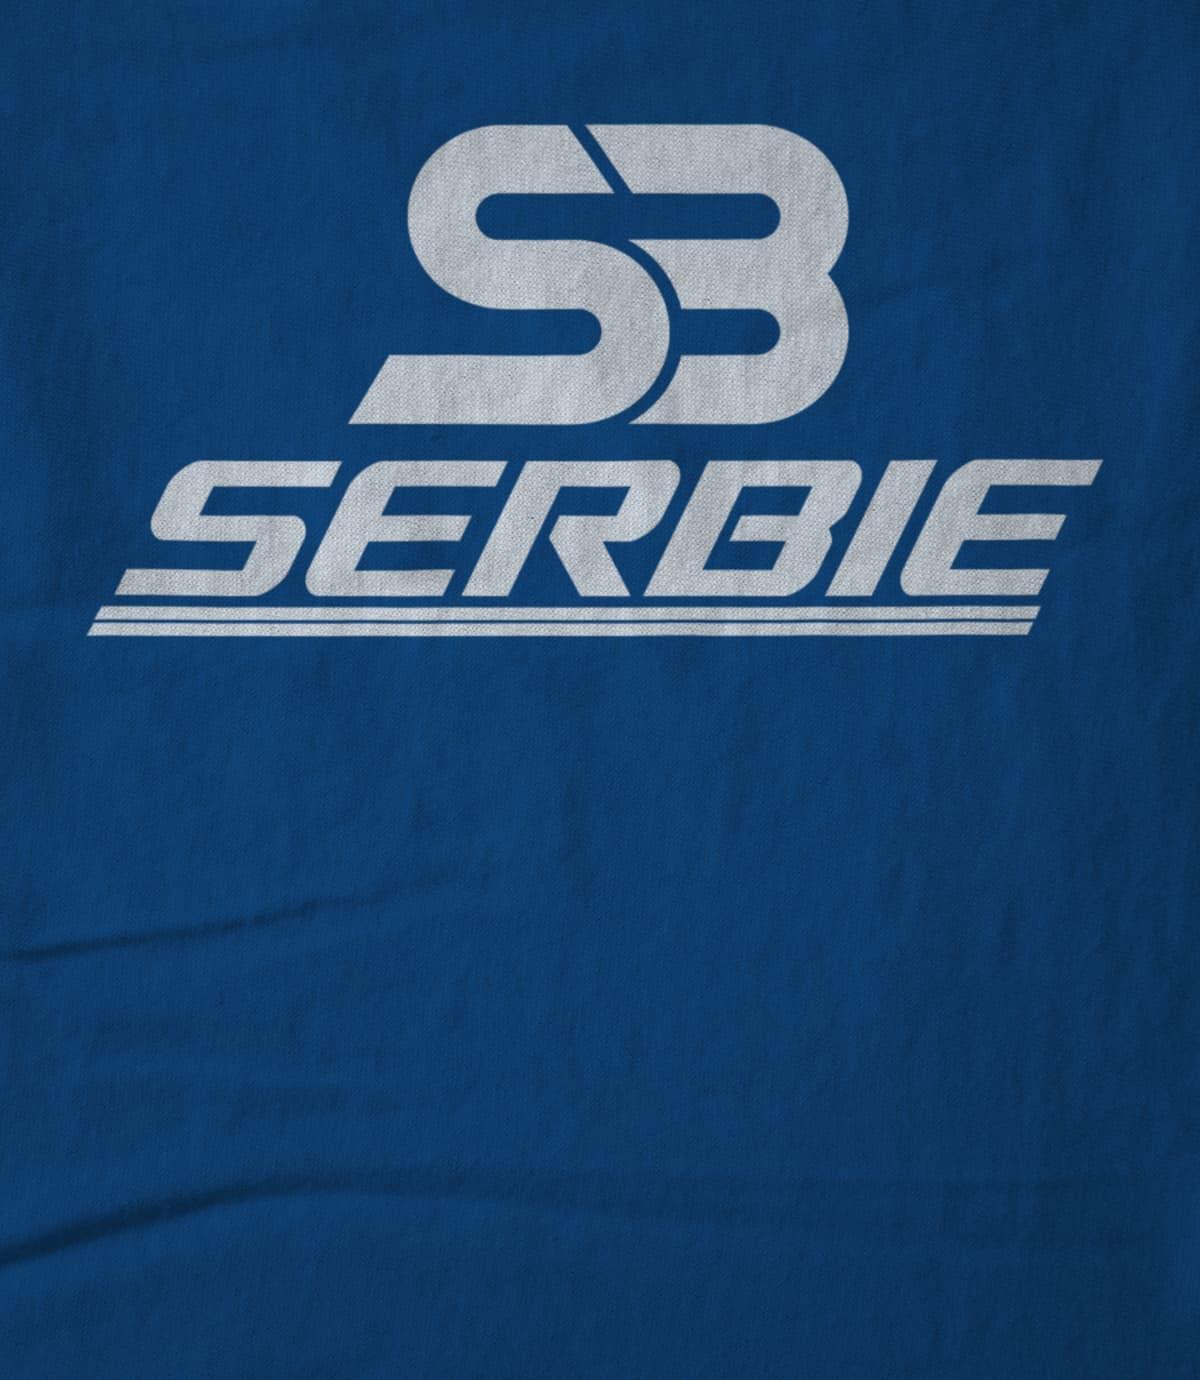 Serbie serbielogo4 1592771415